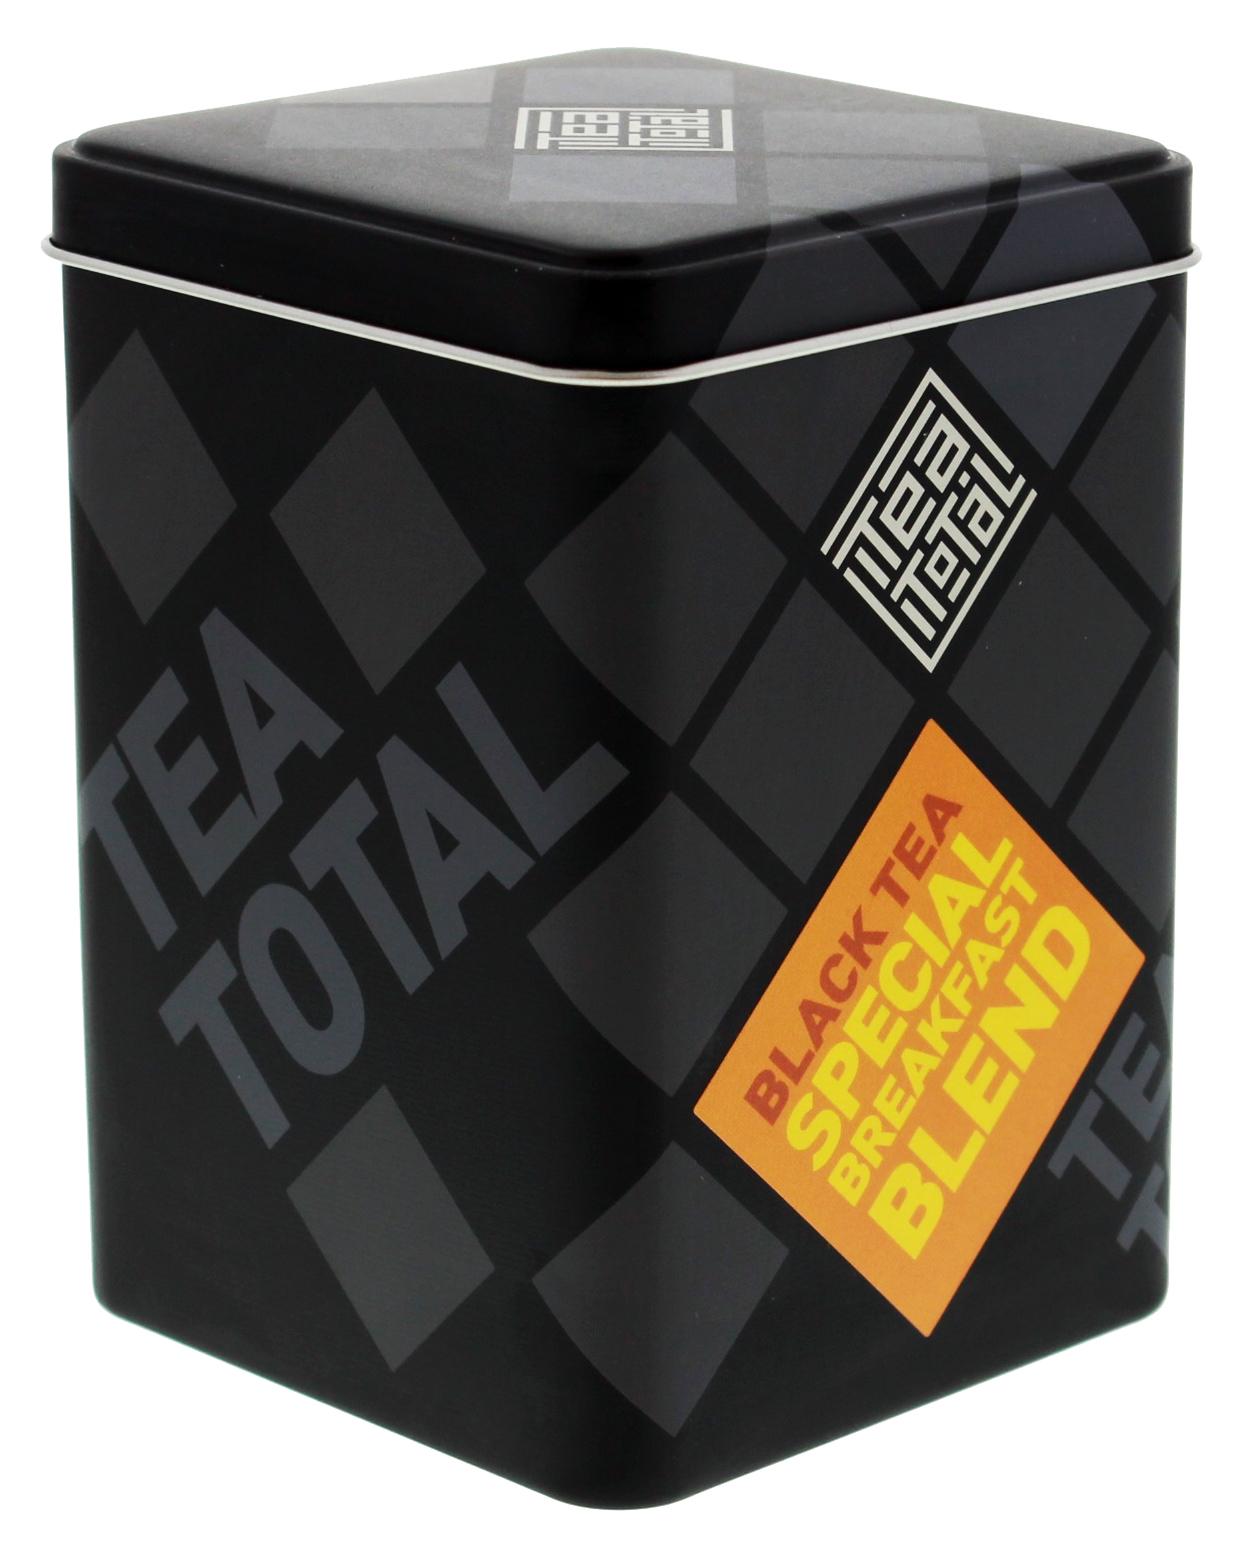 Tea Total - Breakfast Tea Special Blend (100g Tin) image